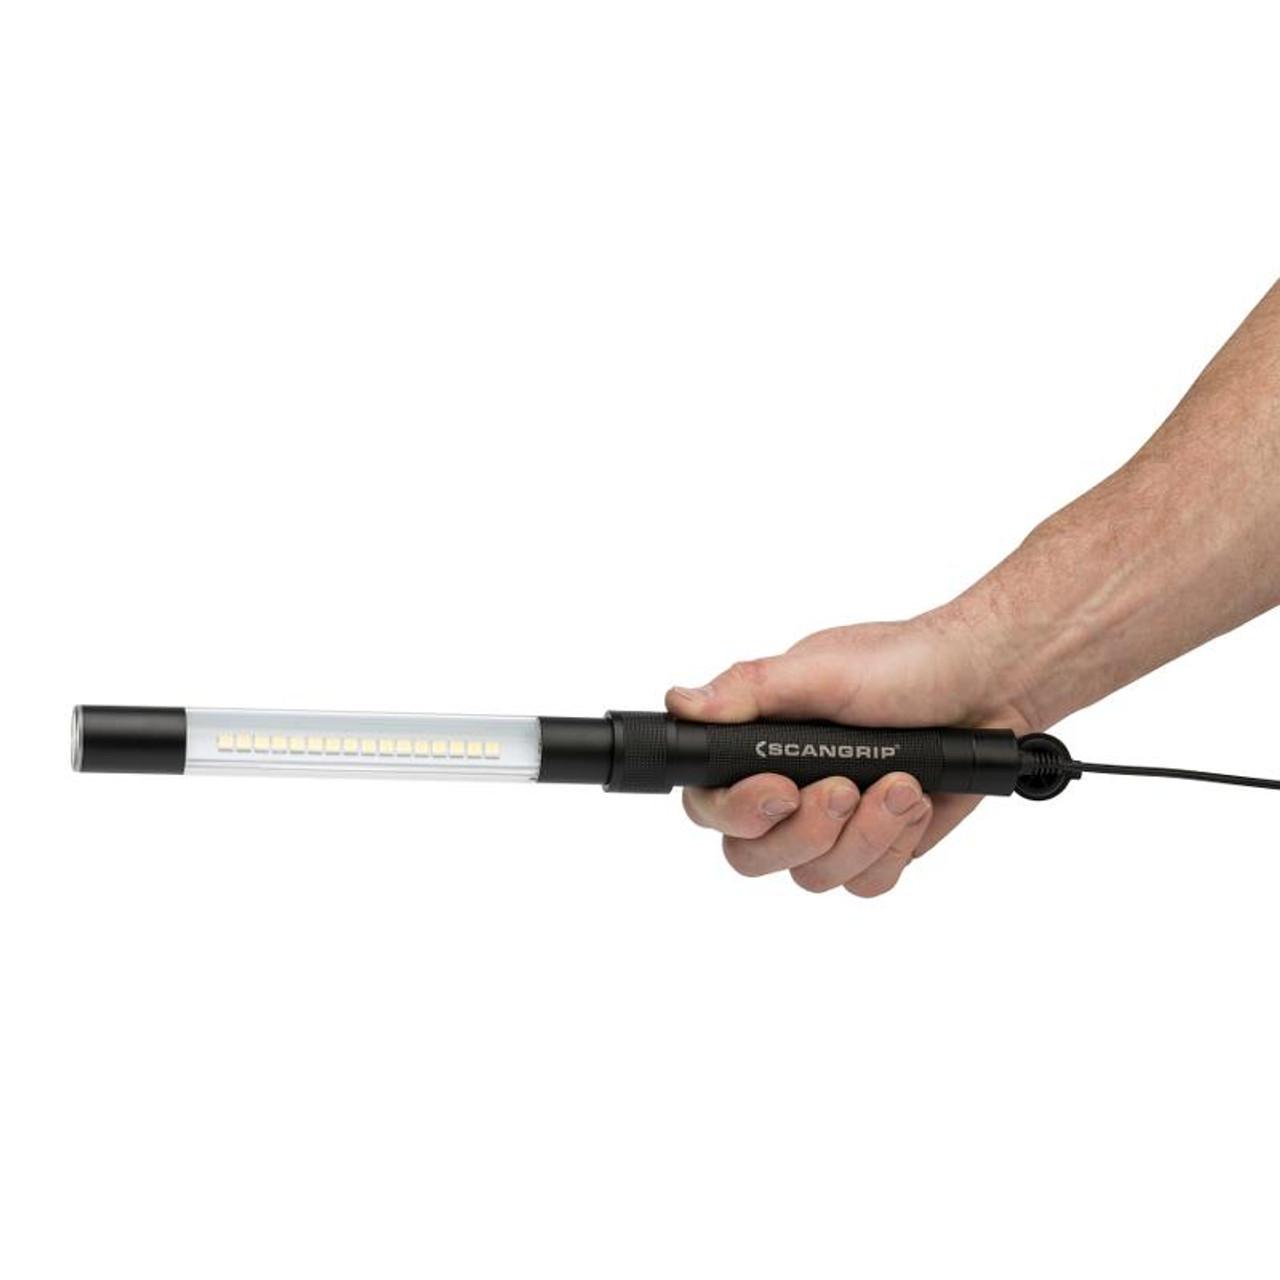 Scangrip LINE LIGHT R Akku LED Arbeitsleuchte Inspektion Stablampe Handlampe